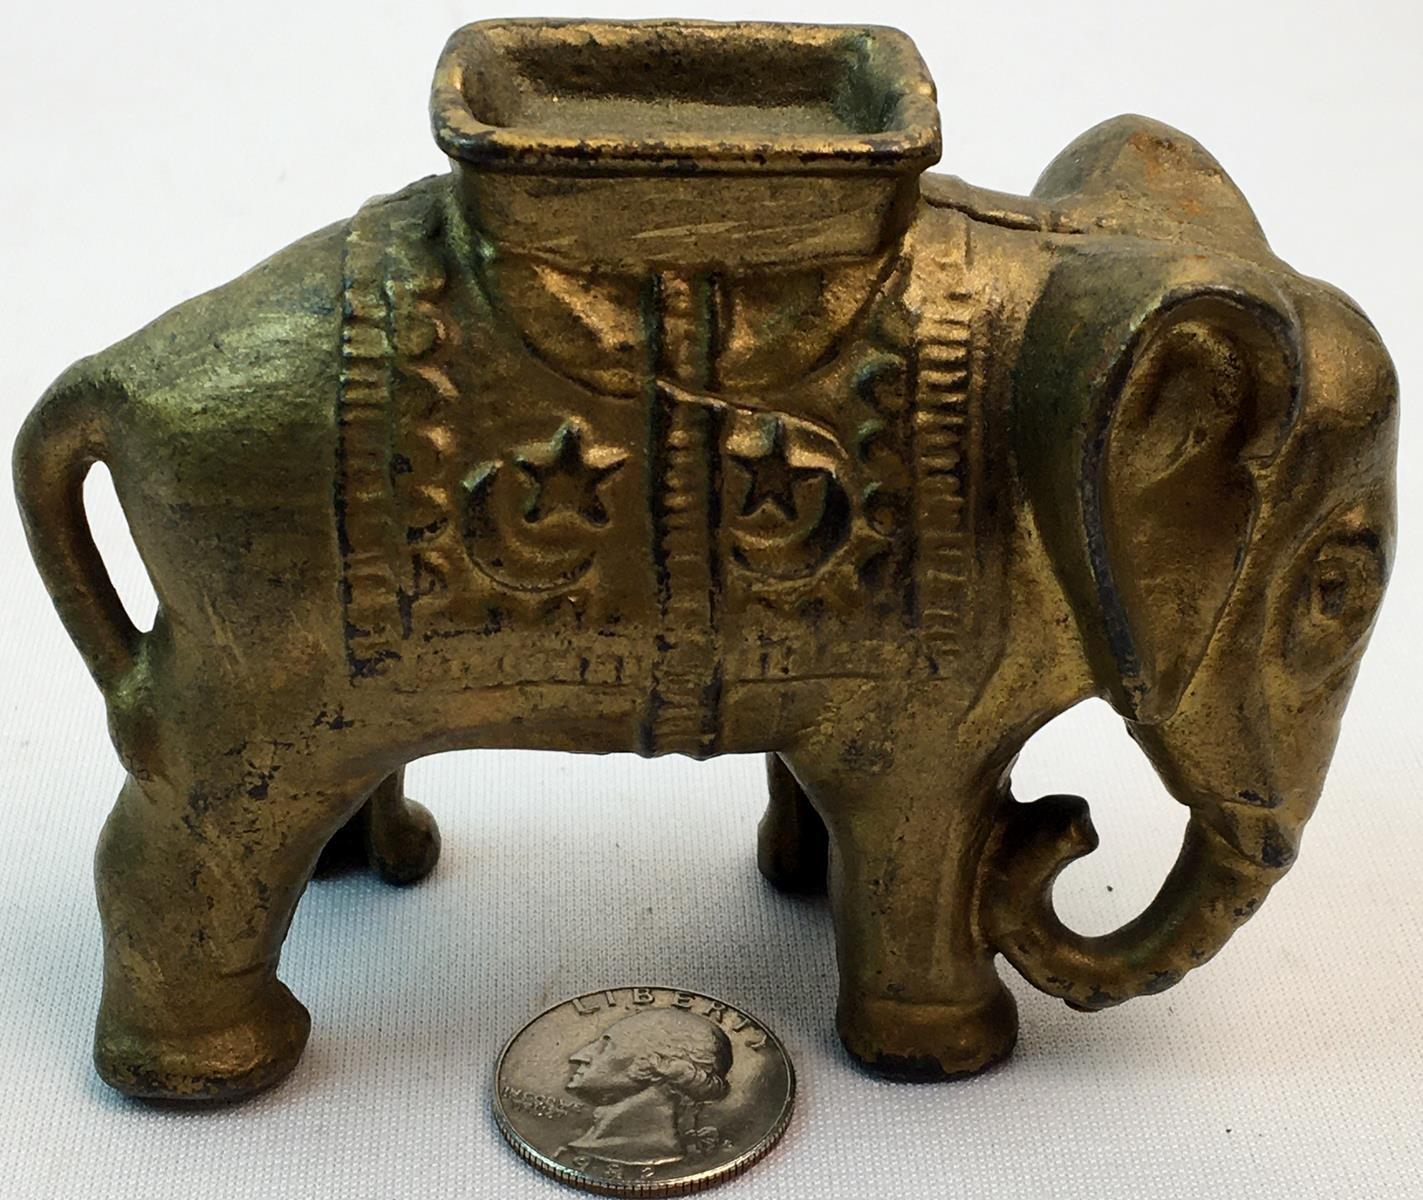 Antique c. 1930 A.C. Williams Elephant With Howdah Cast Iron Still Coin Bank W/ Original Gold Paint